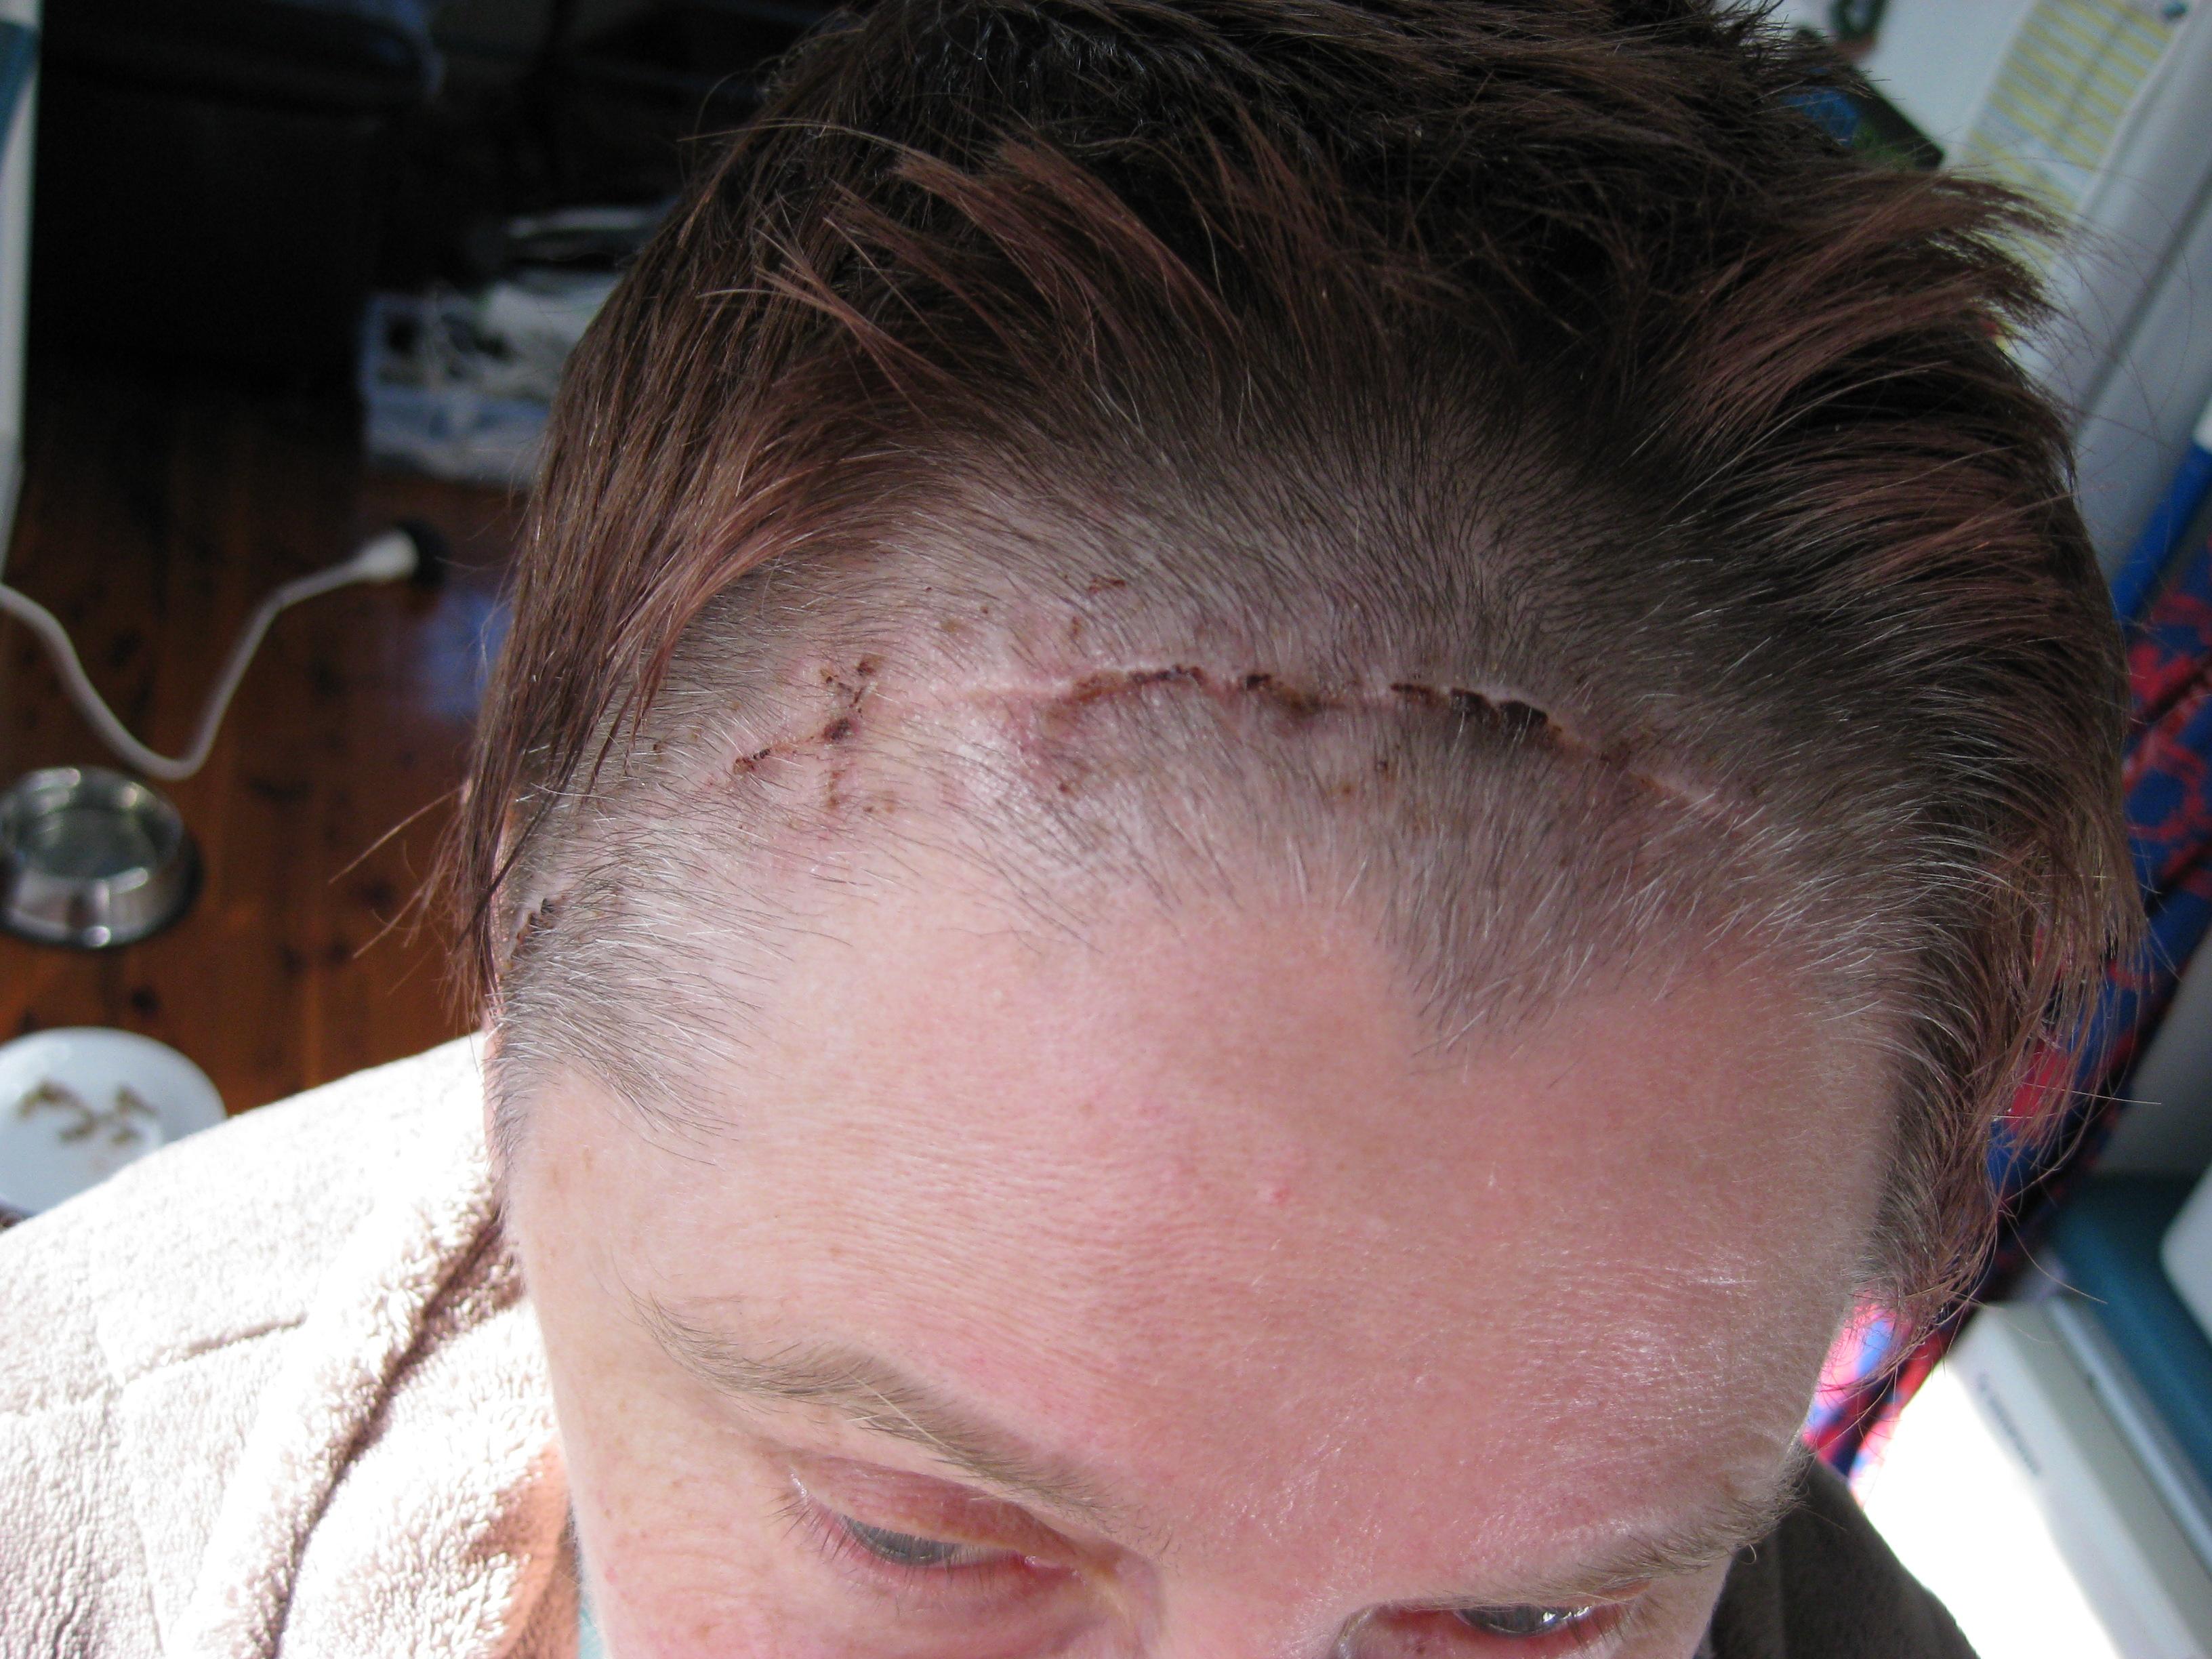 Brain tumor surgery scars